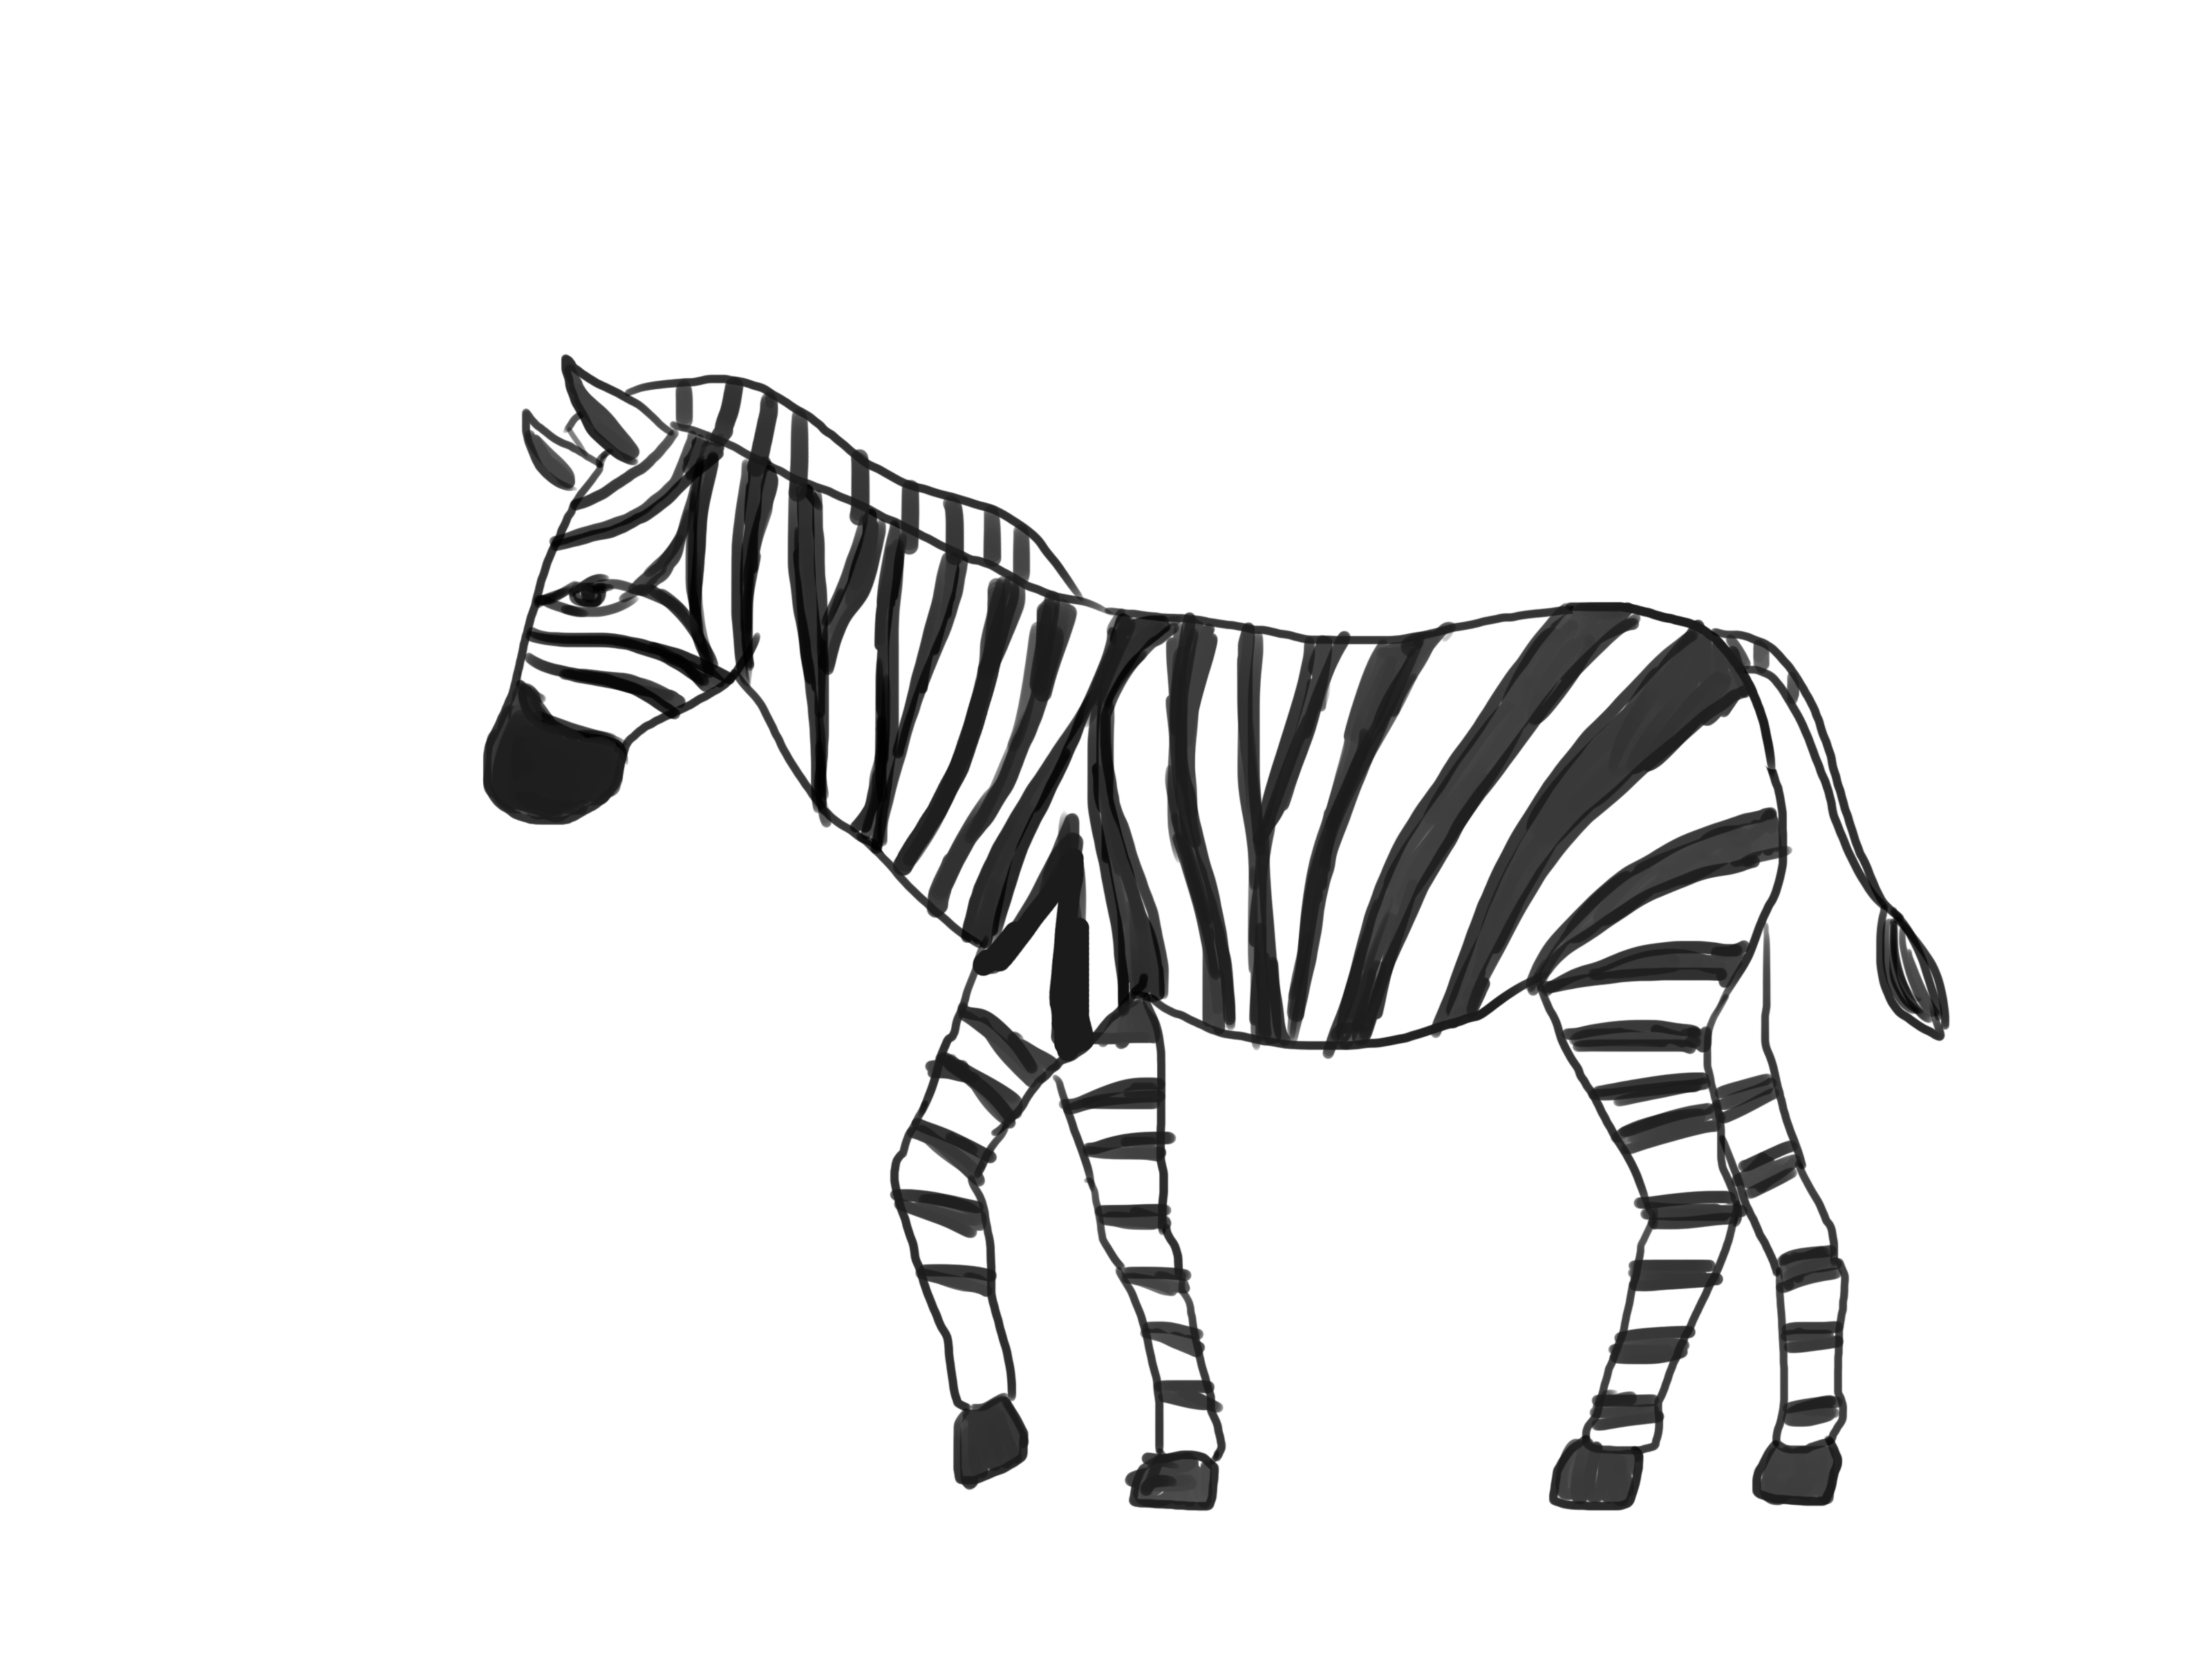 Cute Simple Line Art : Cute zebra drawing at getdrawings free for personal use